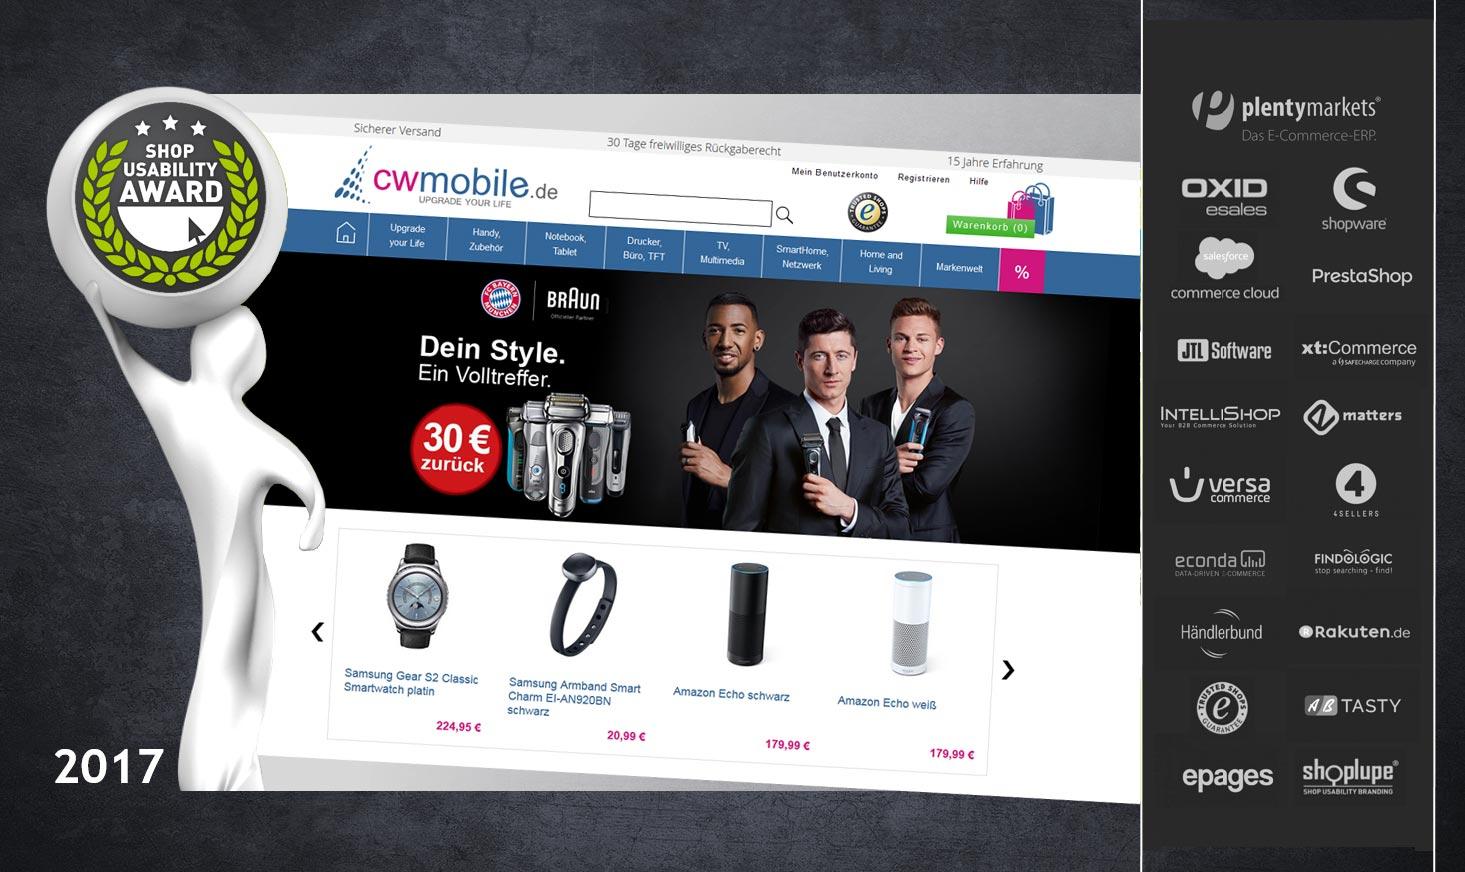 "cw-mobile.de hat es dabei 2017 unter die Top 5 Online Shops in der Kategorie ""Elektronik, Software & Handy"" geschafft."